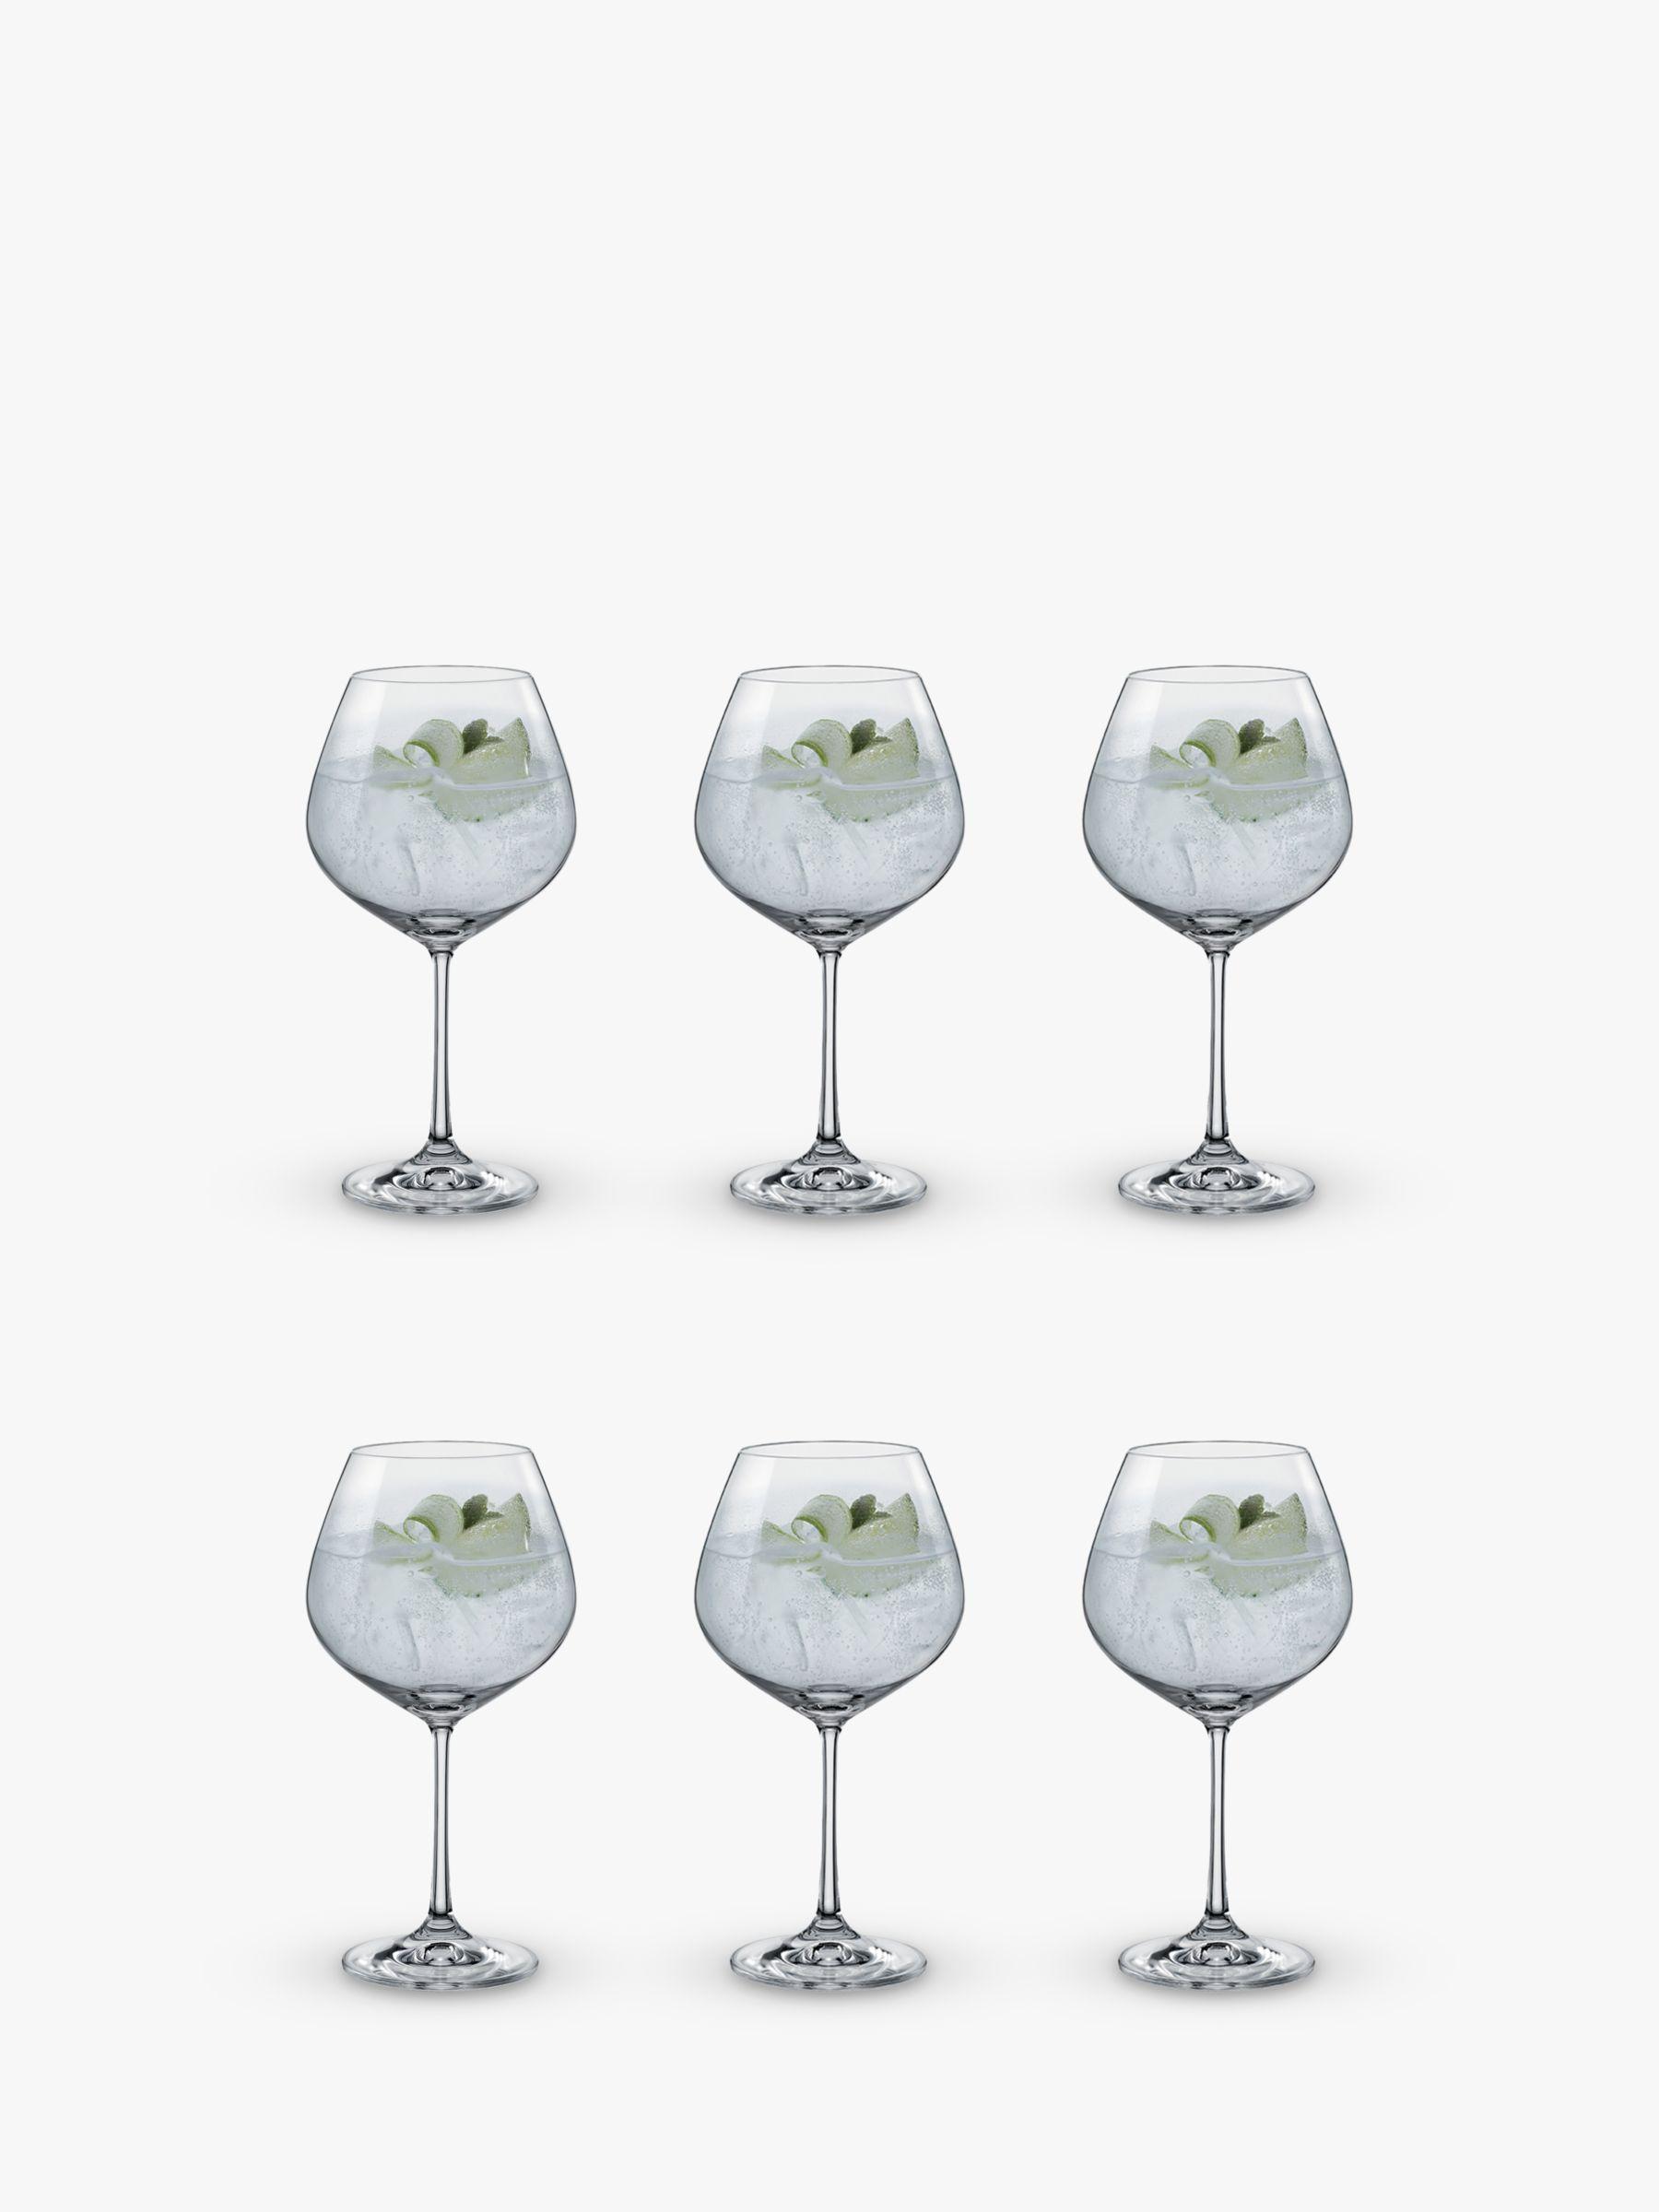 Dartington Crystal Simplicity Copa Gin Glasses, 570ml, Set of 6, Clear